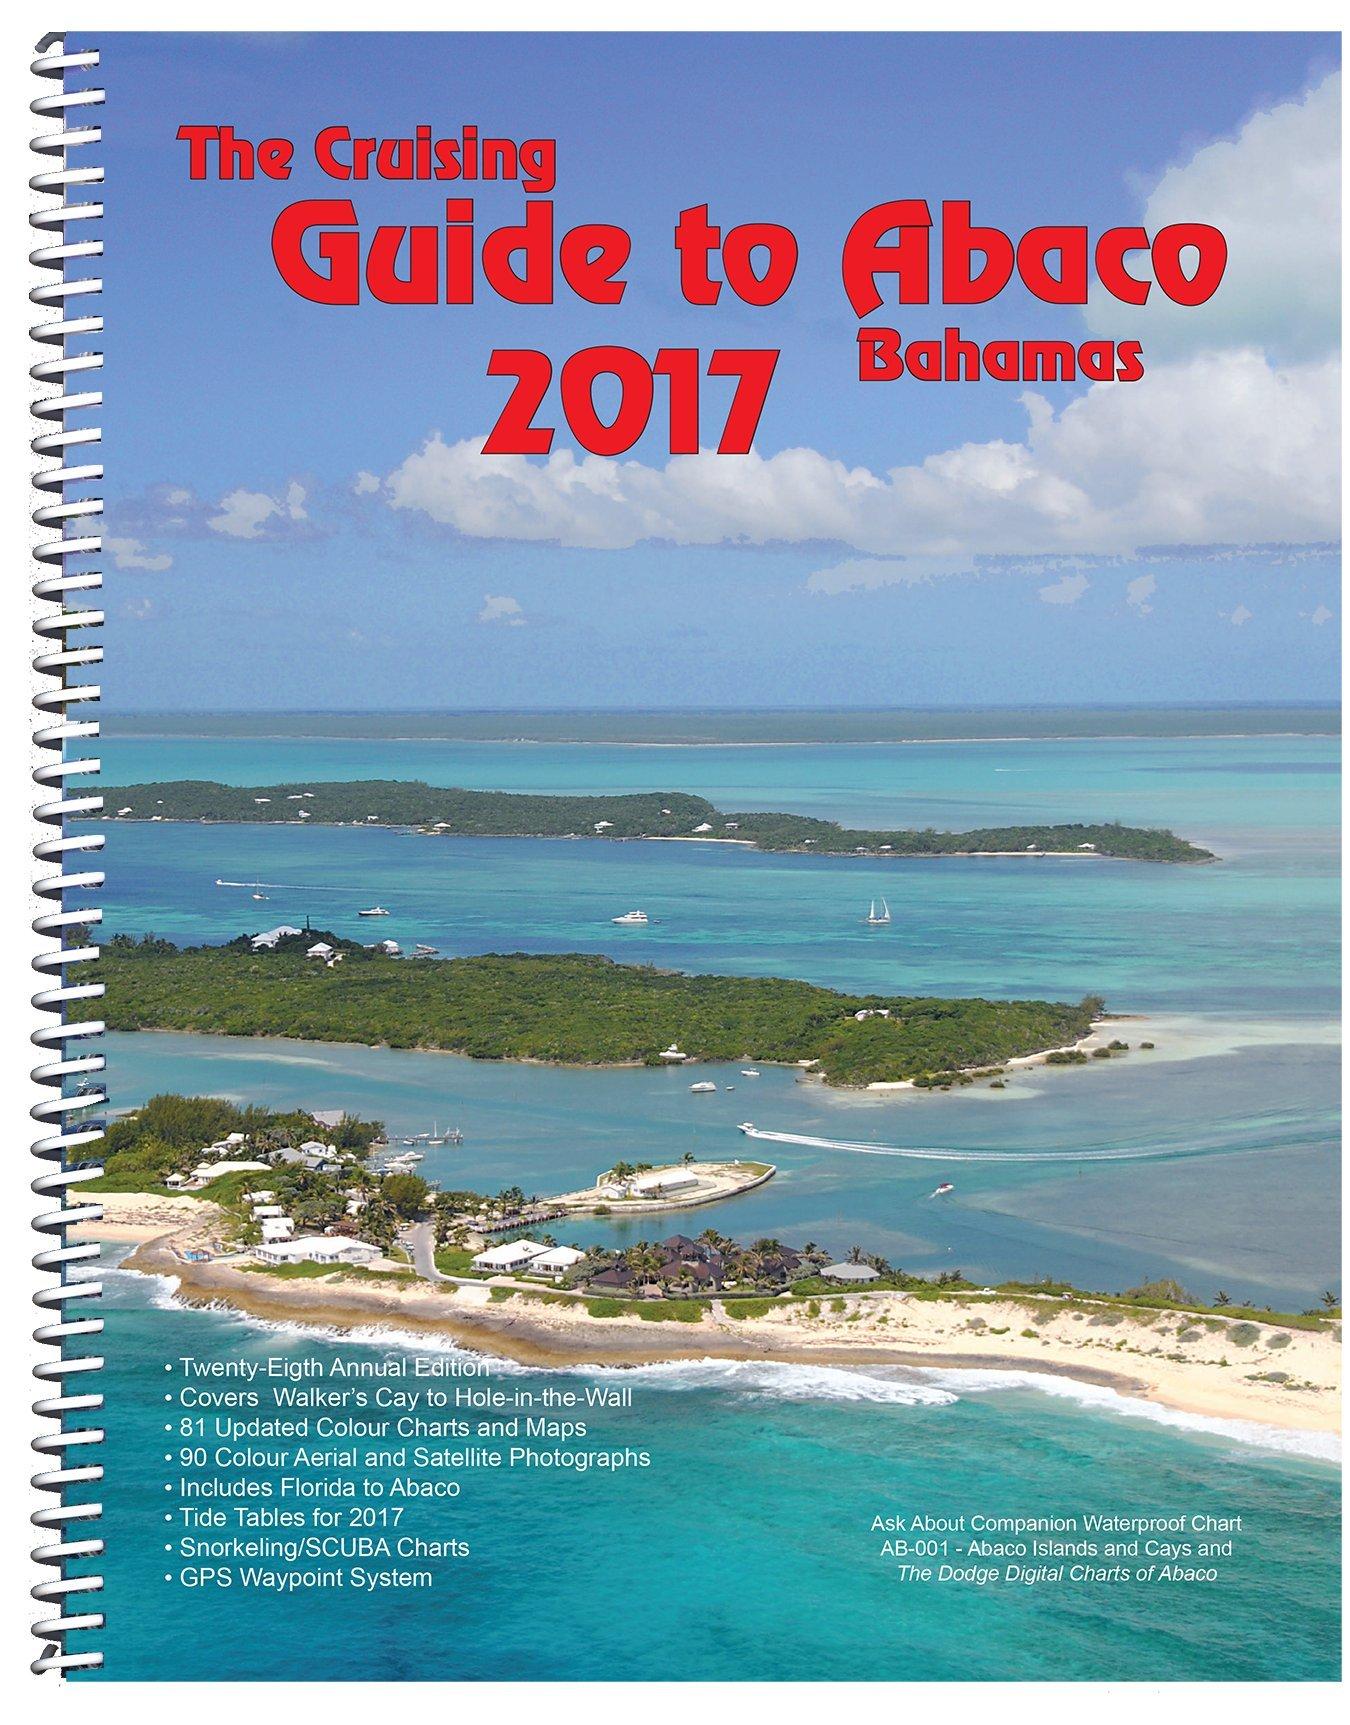 The Cruising Guide to Abaco, Bahamas: 2017: Steve Dodge, Jon Dodge, Jeff  Dodge: 9780932265975: Amazon.com: Books